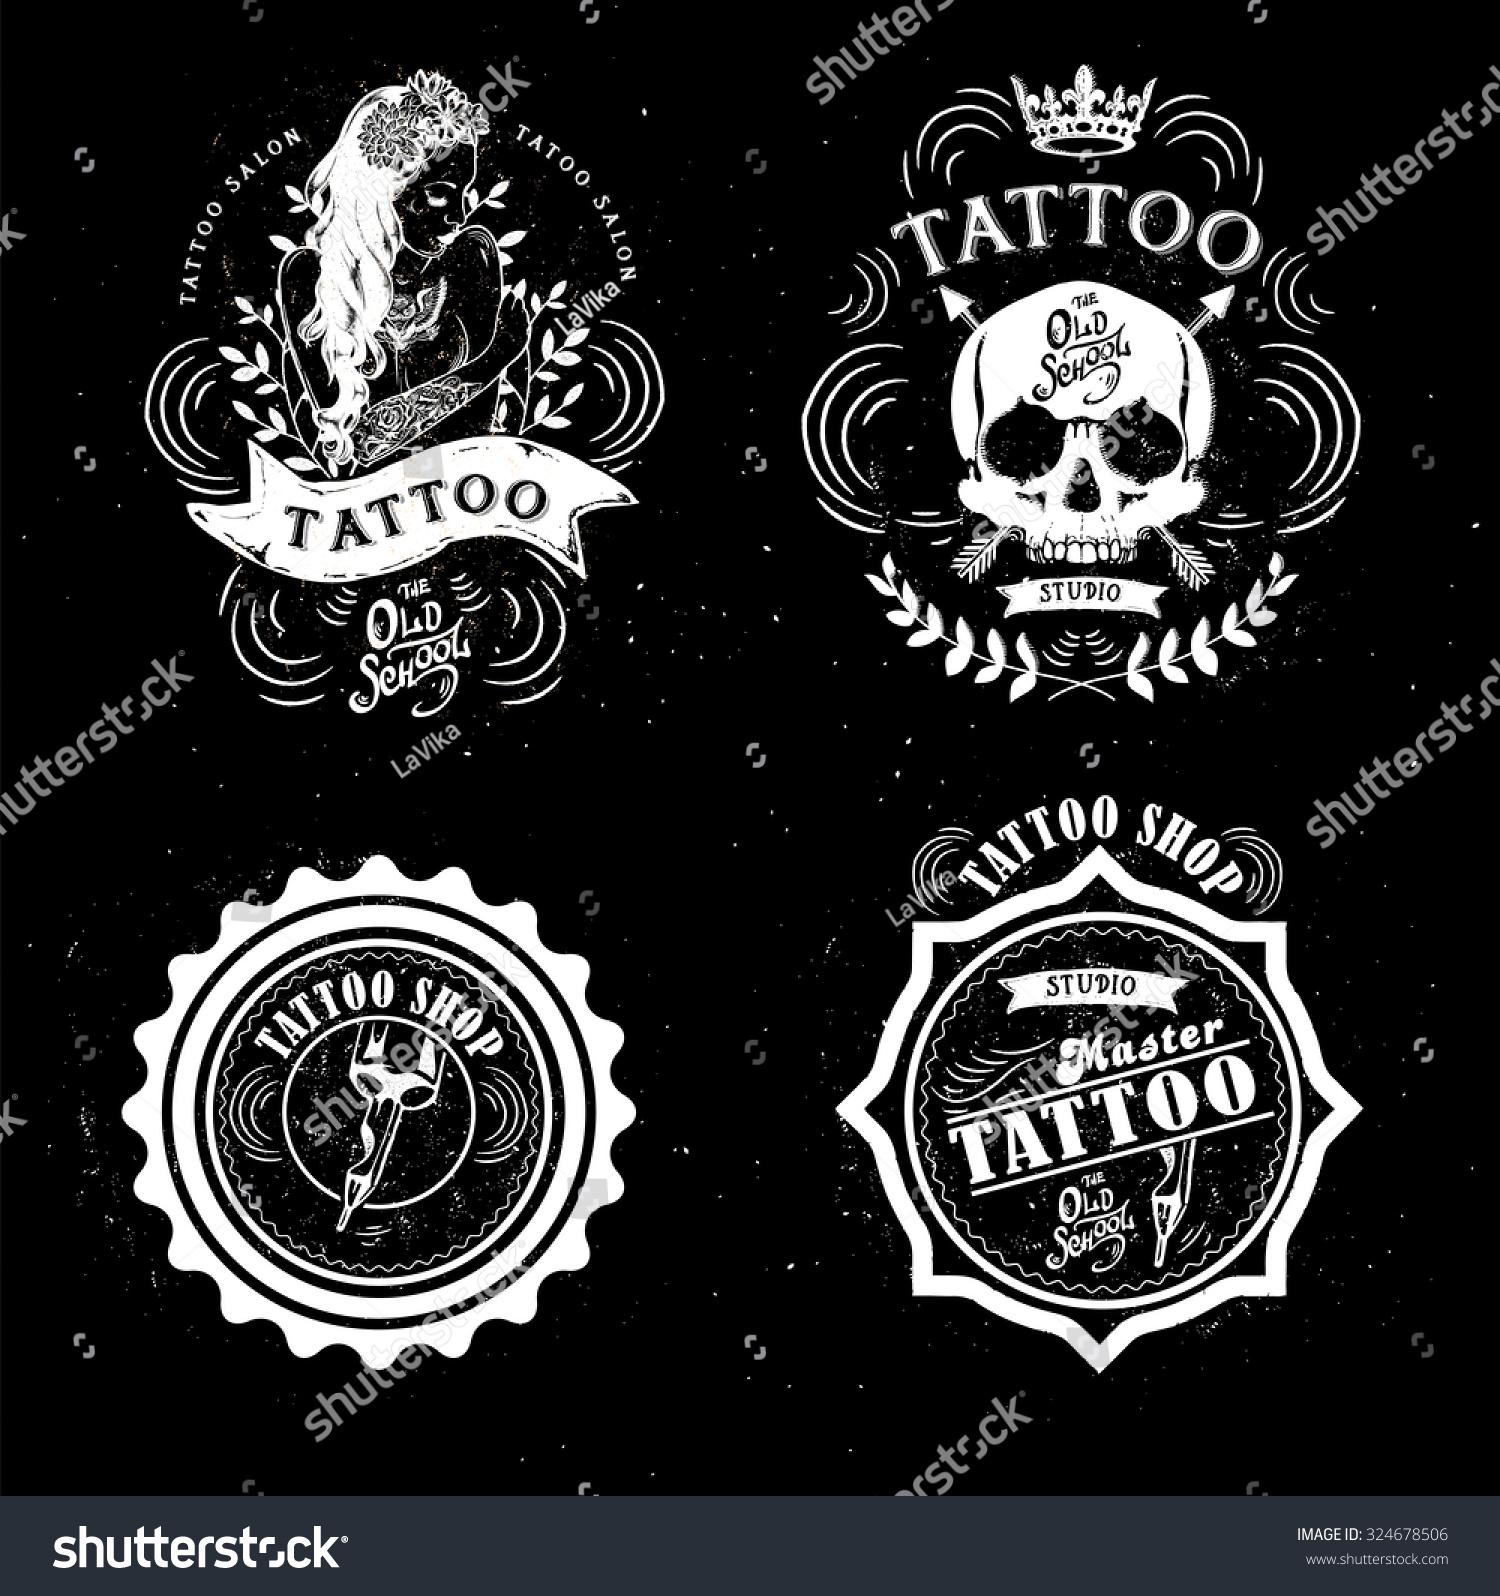 Cool Tattoo Backgrounds: Set Vector Tattoo Studio Logo Templates Stock Vector